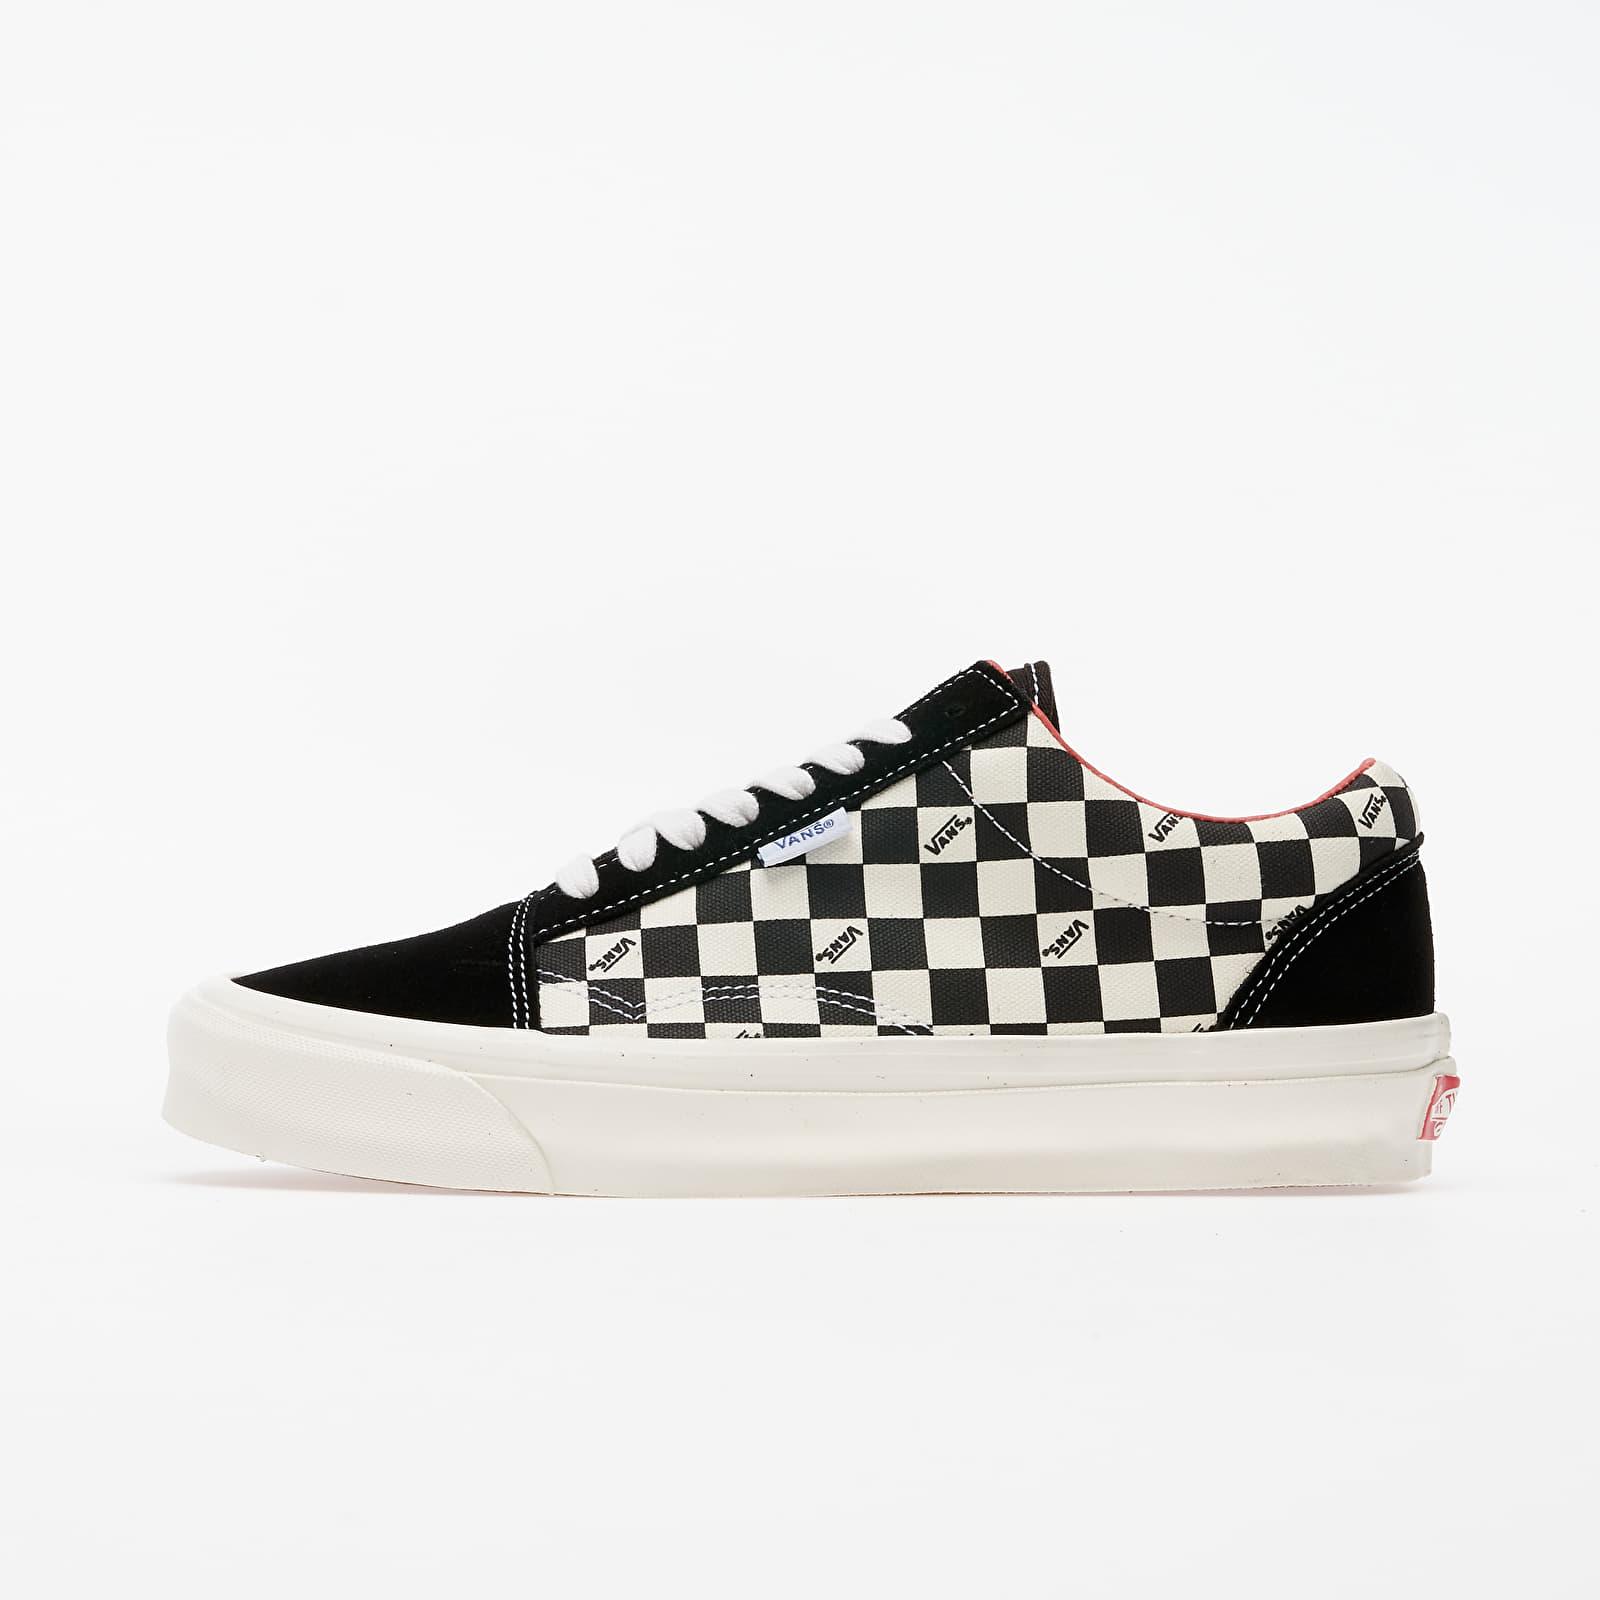 Herren Sneaker und Schuhe Vans Old Skool NS OG LX (Suede/ Canvas) Checkerboard